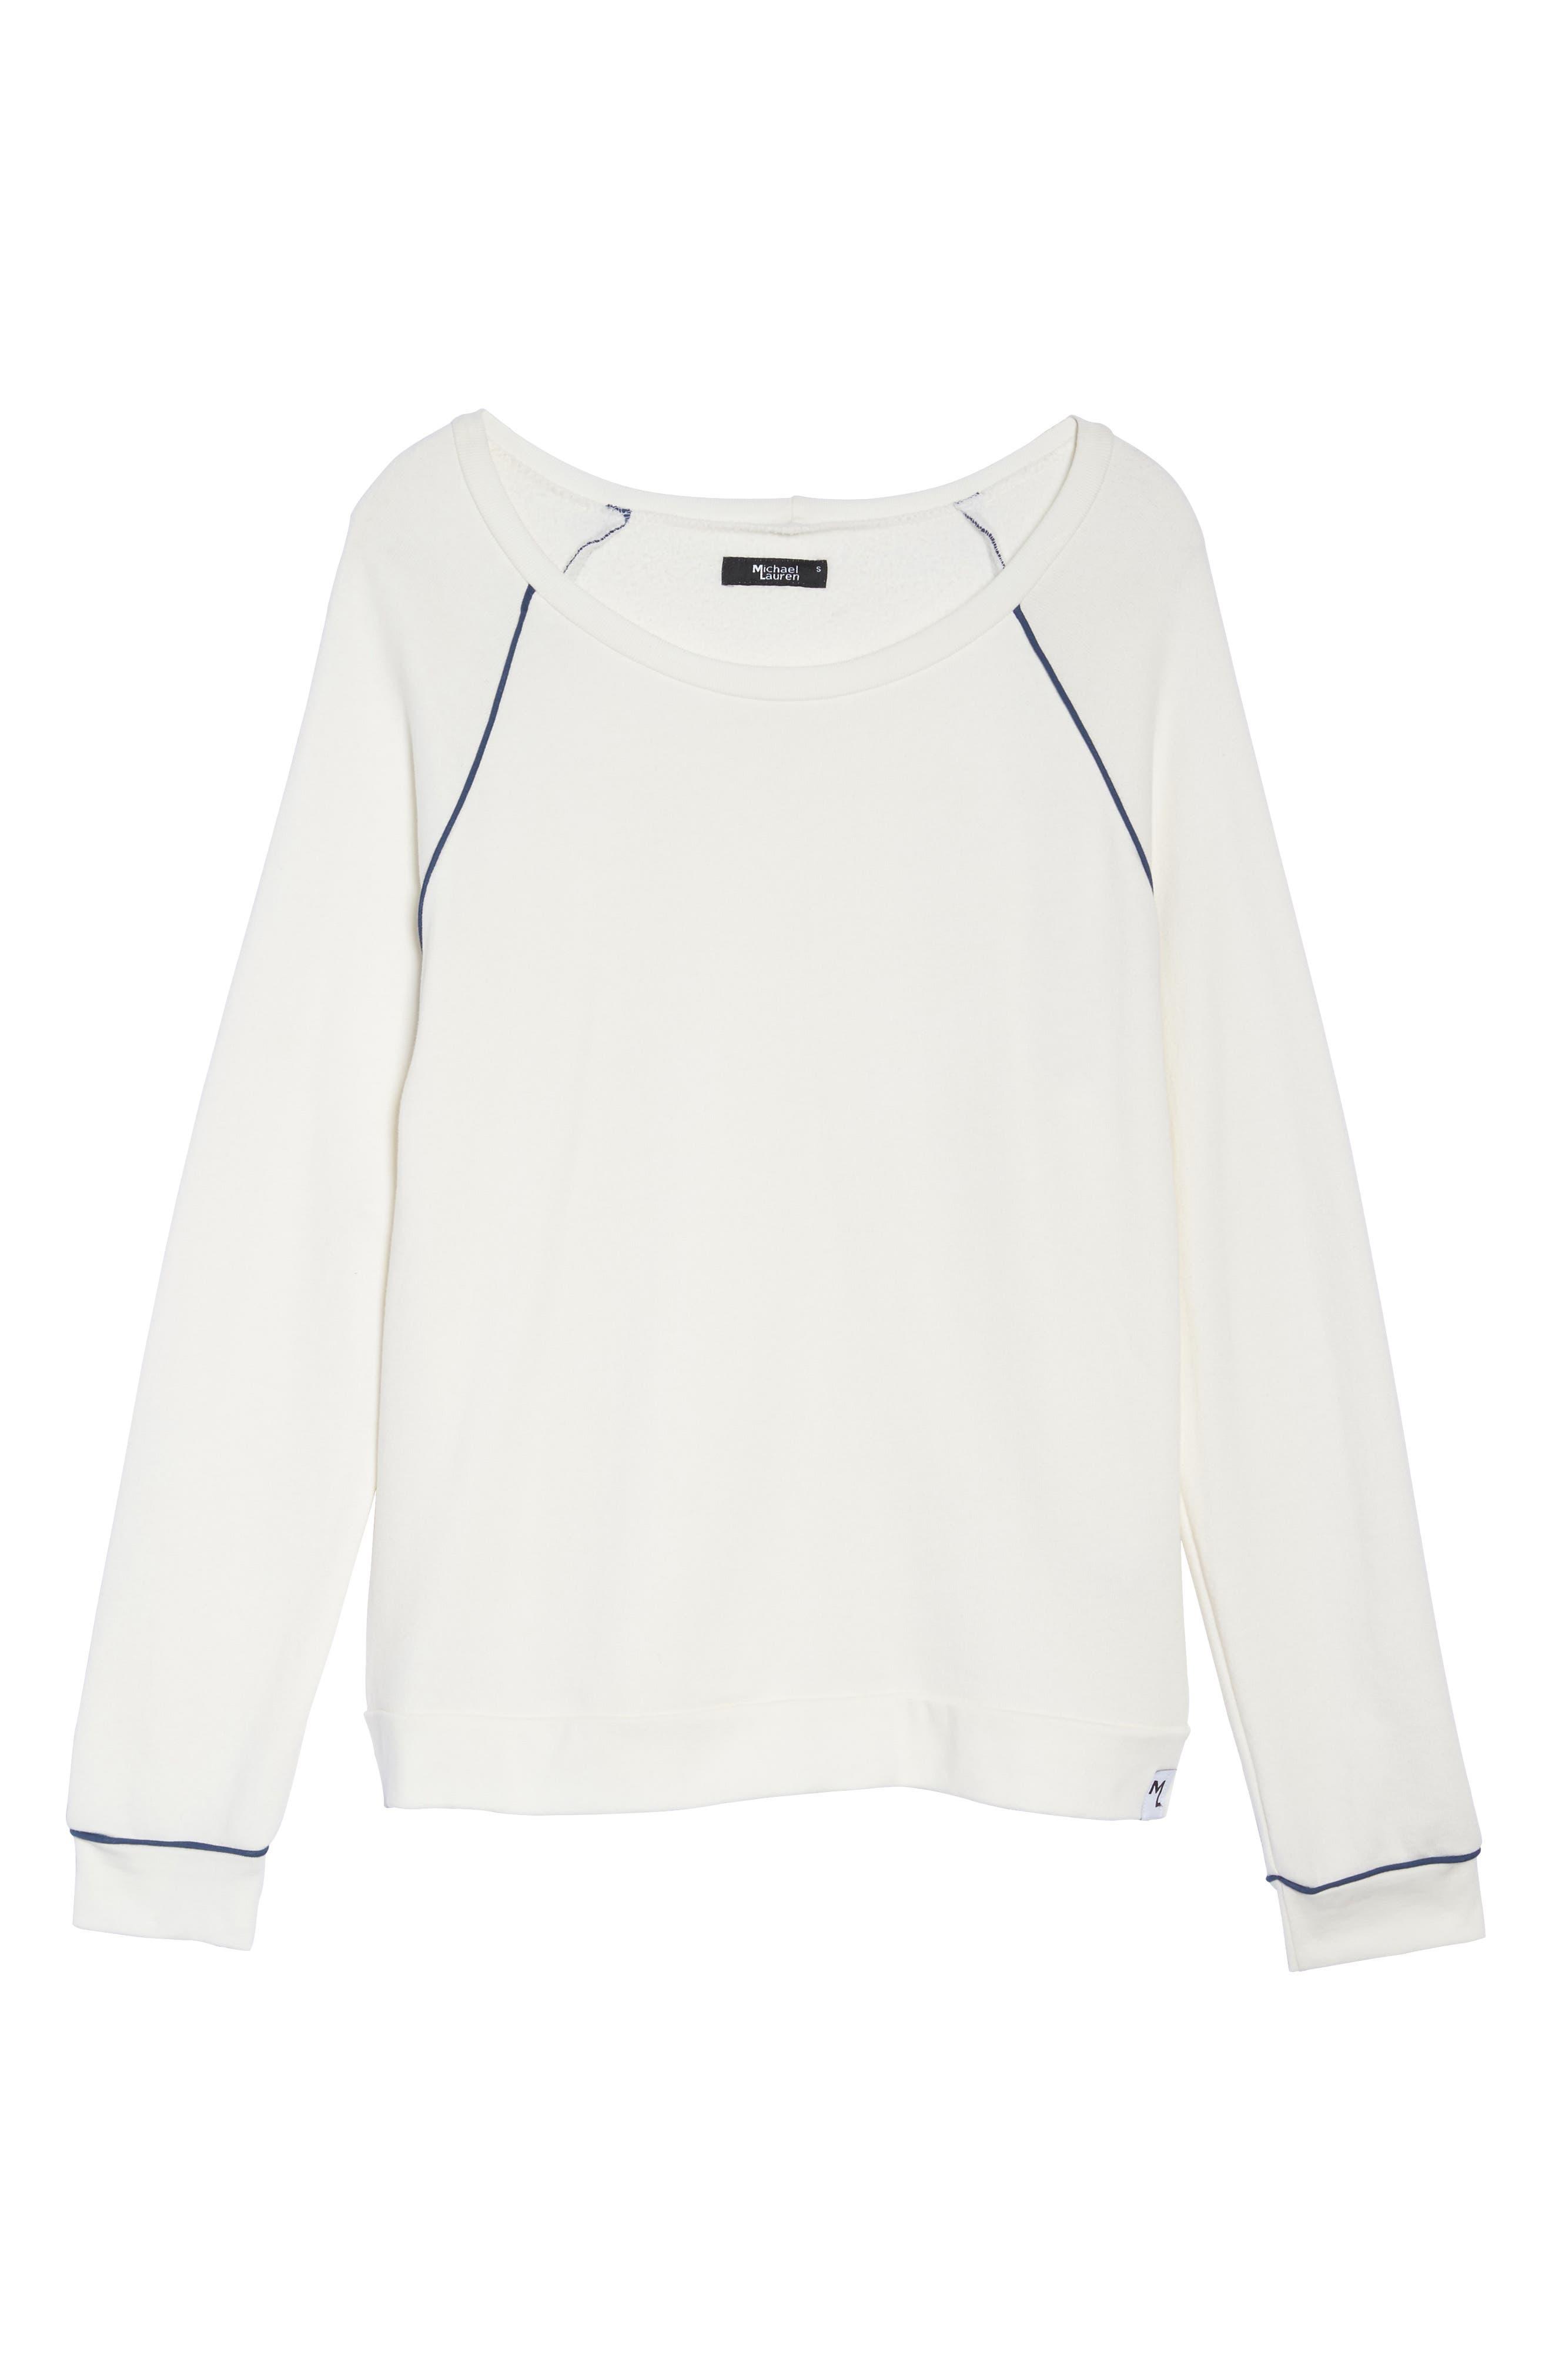 Juniper Lounge Sweatshirt,                             Alternate thumbnail 6, color,                             900